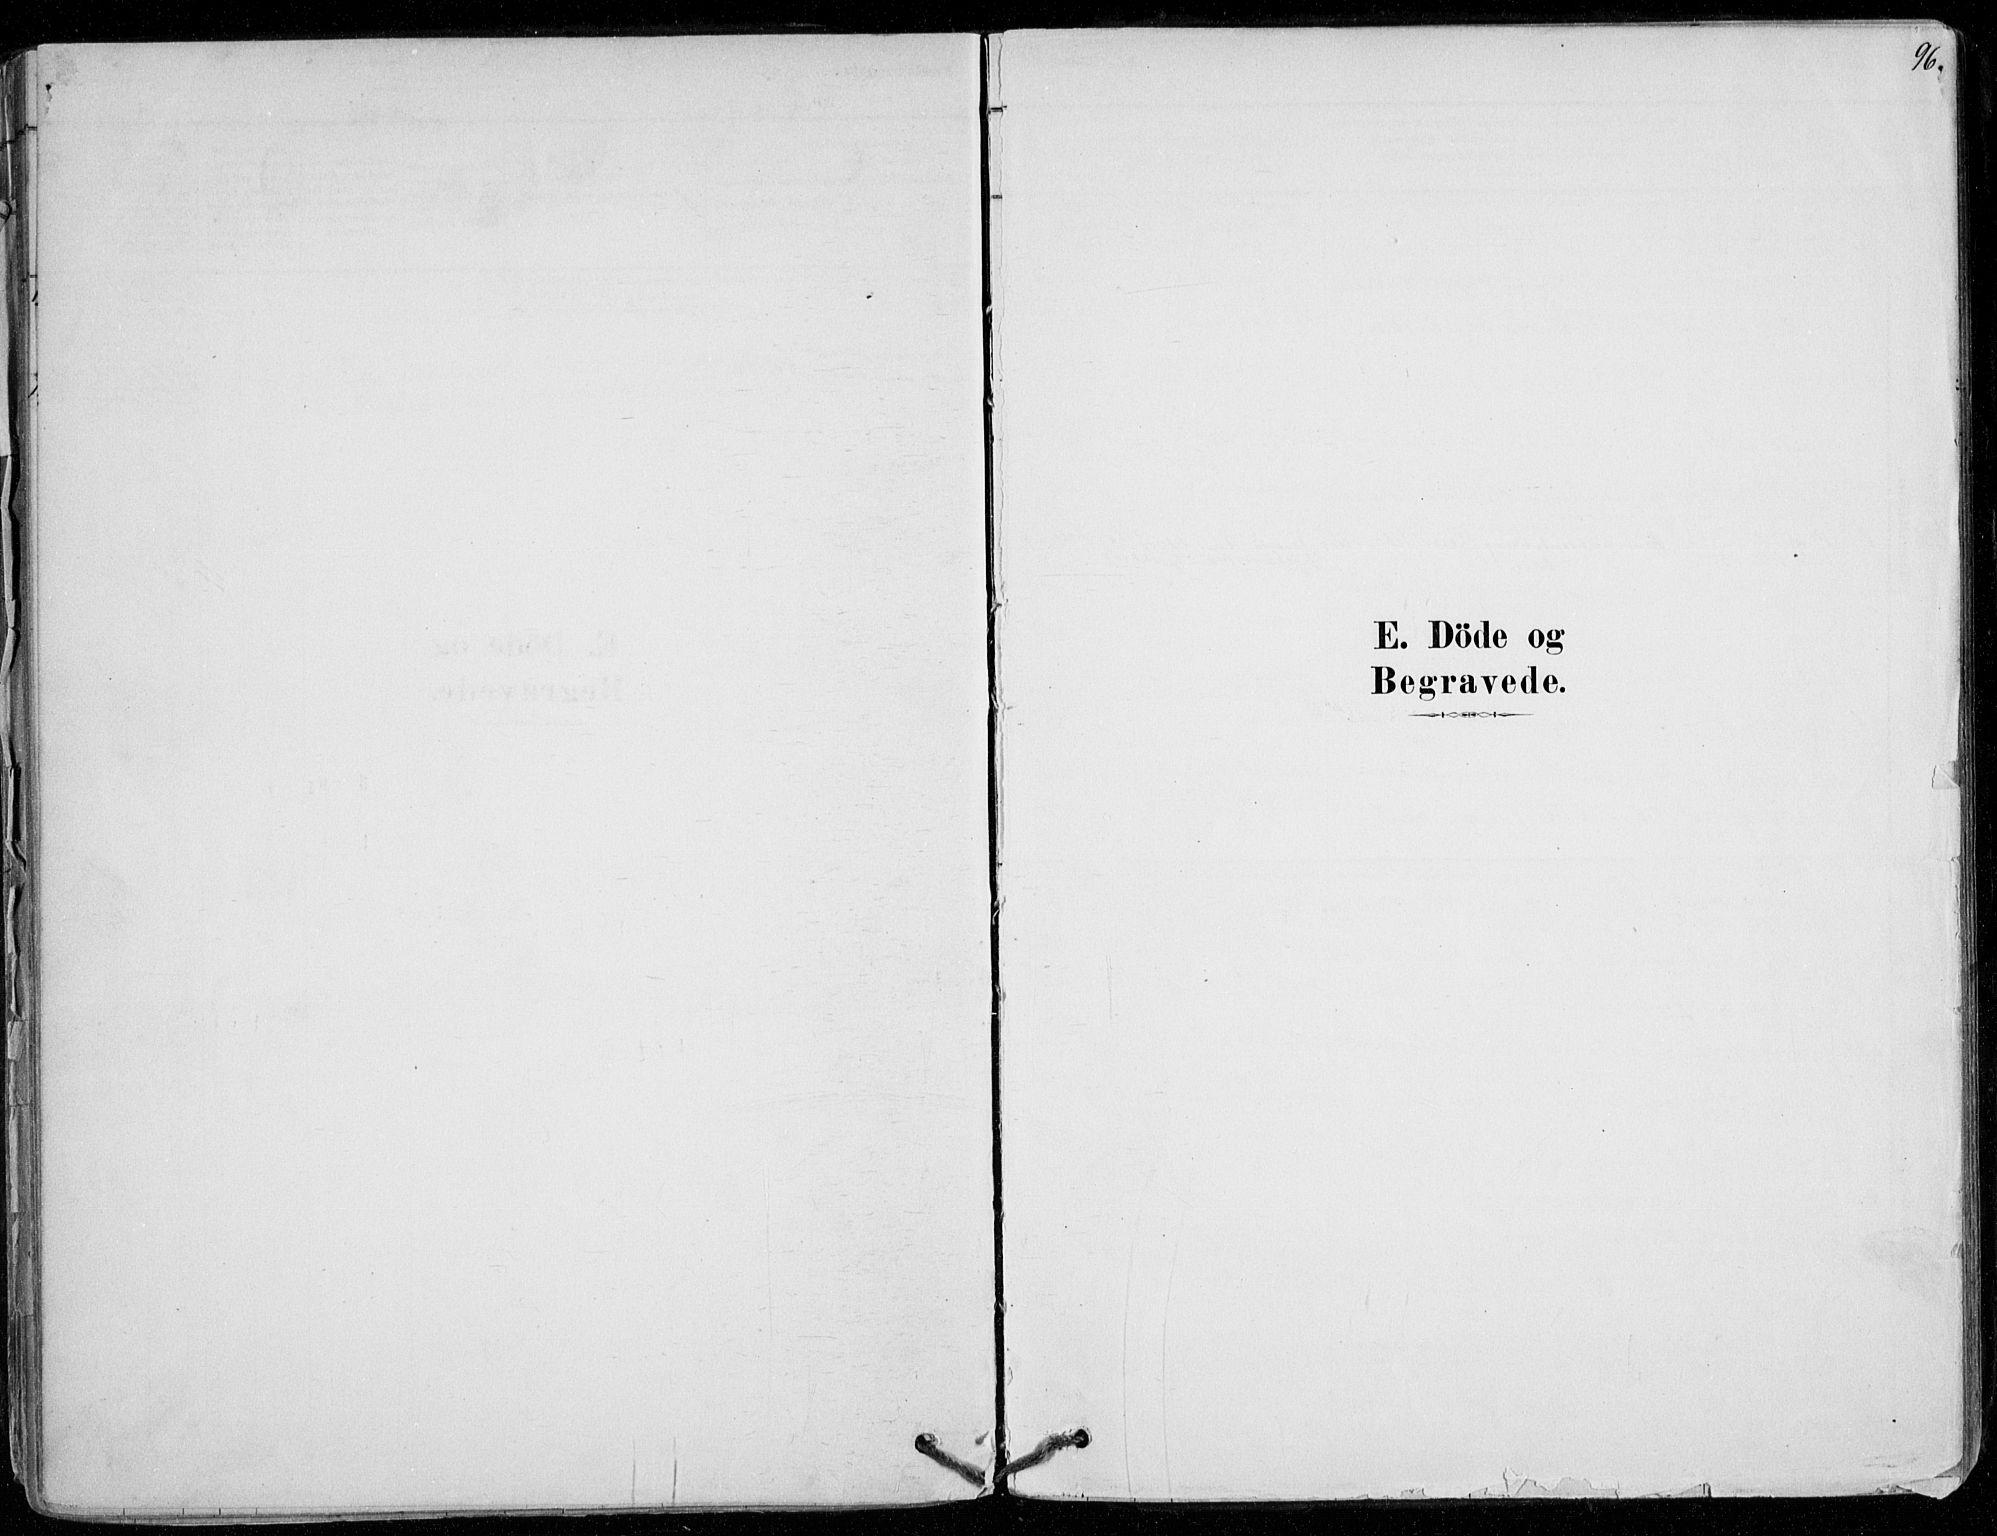 SAO, Vestby prestekontor Kirkebøker, F/Fd/L0001: Ministerialbok nr. IV 1, 1878-1945, s. 96